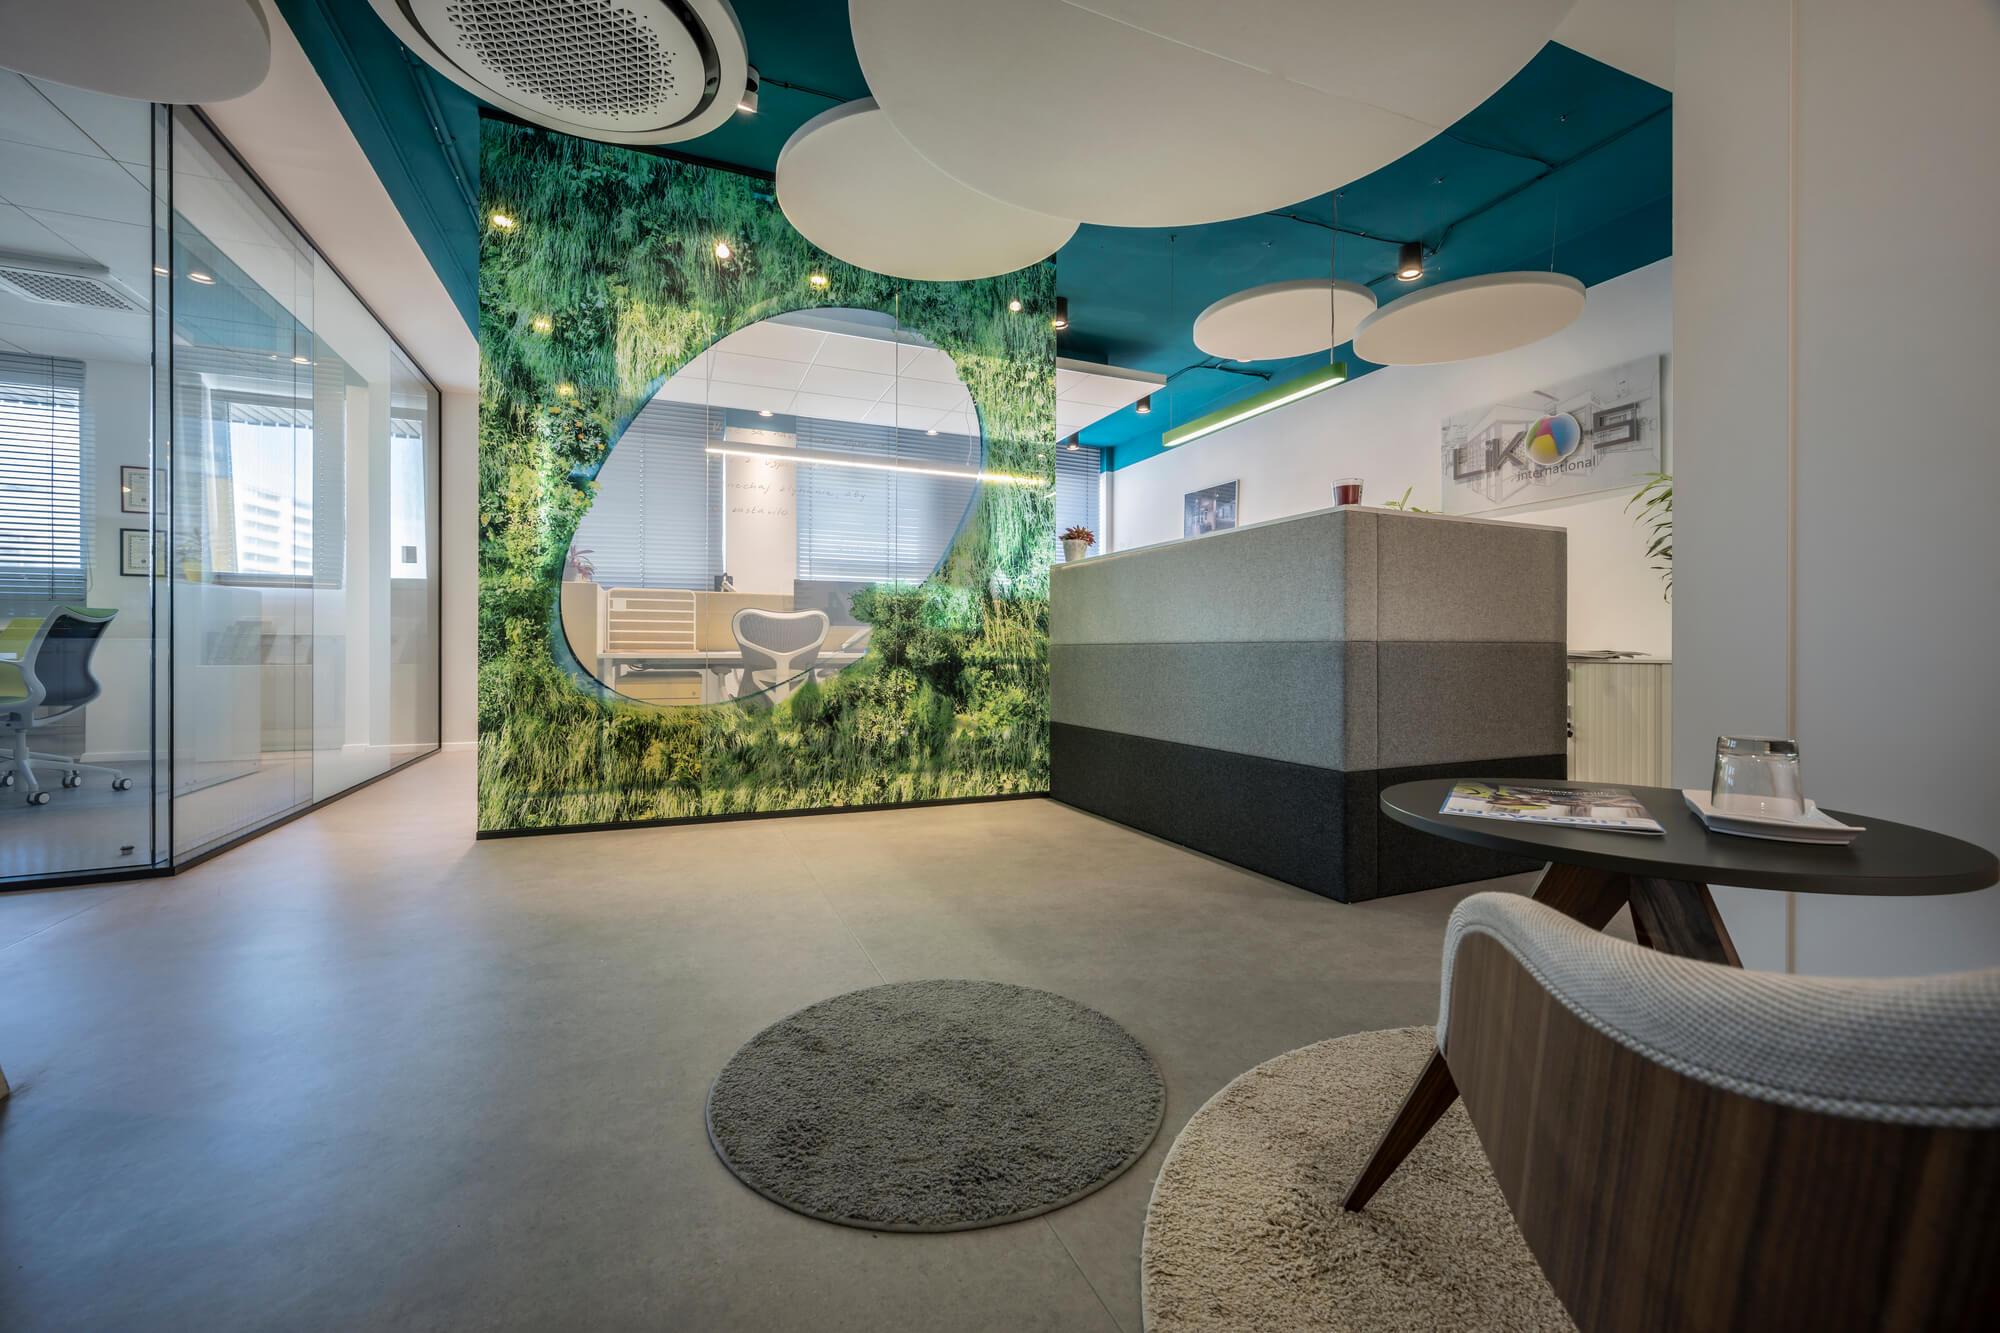 LIKO-S Office as a showroom